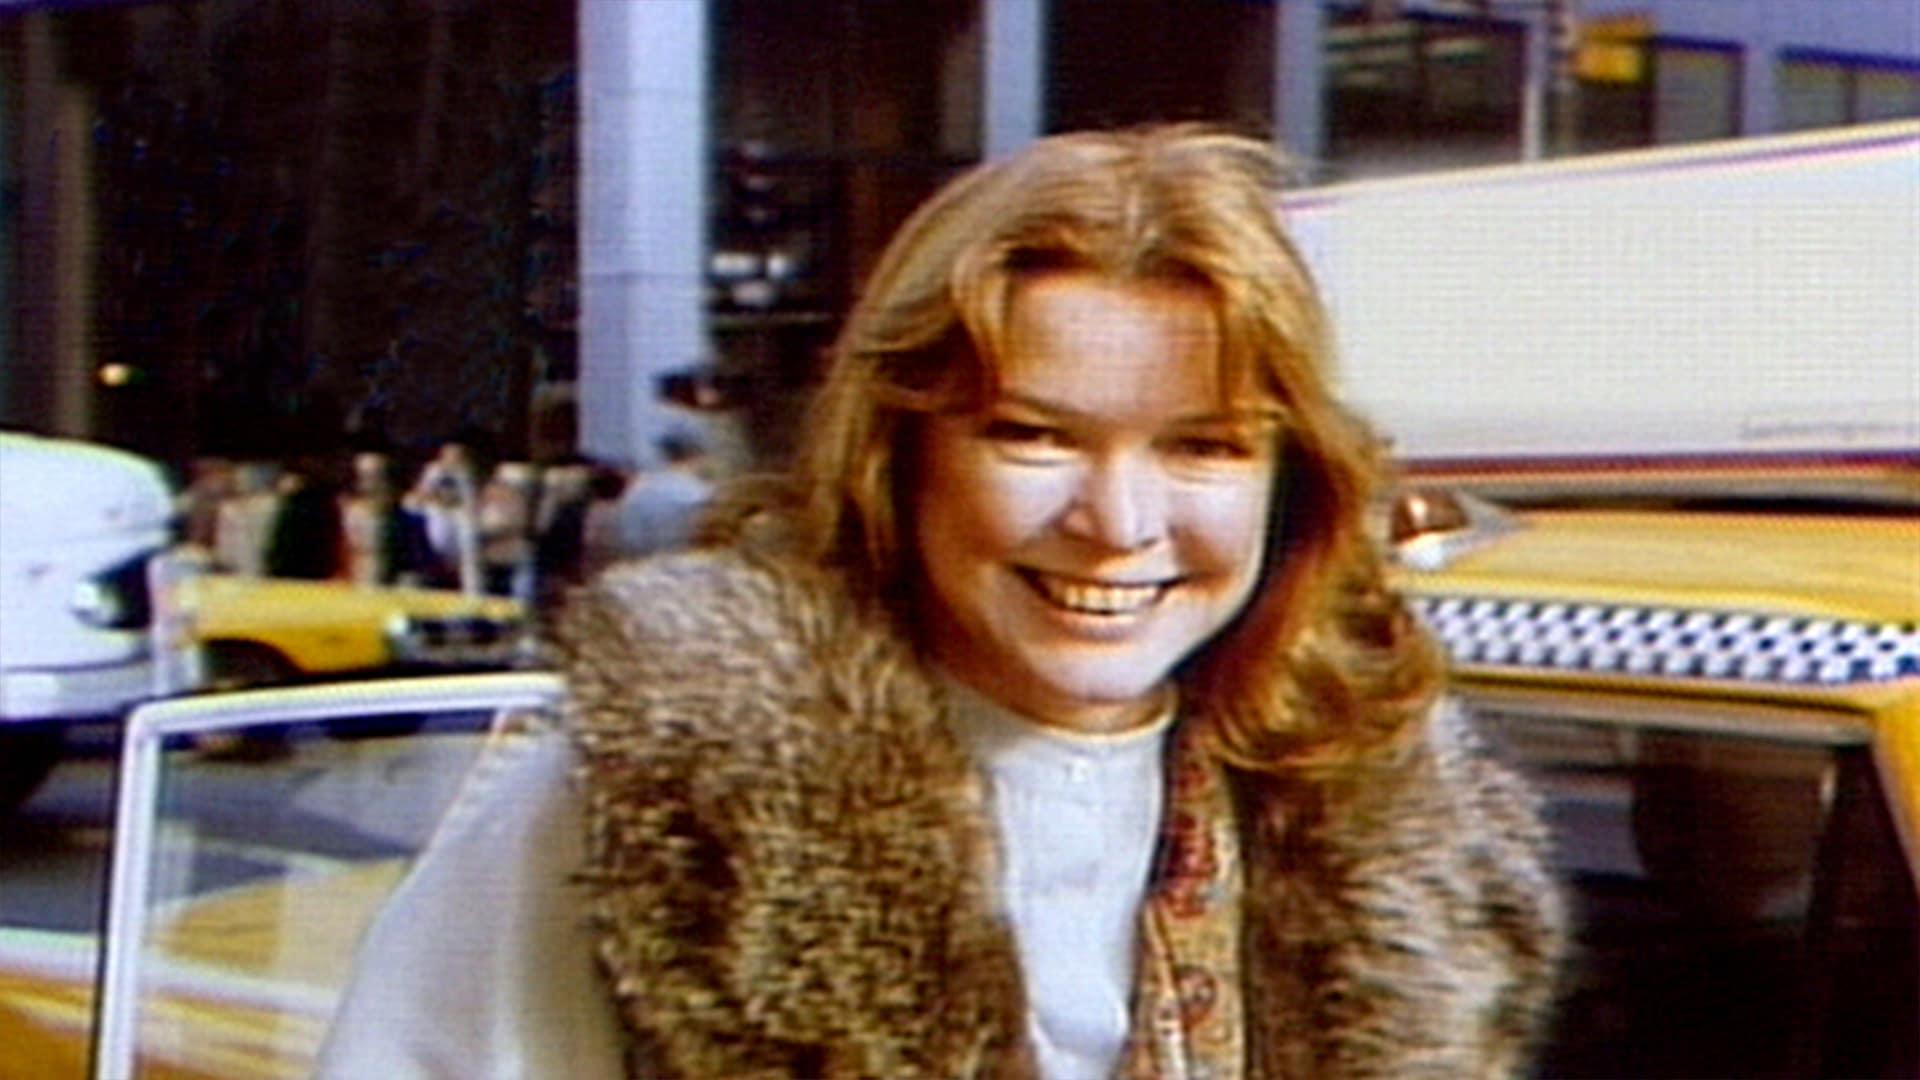 Ellen Burstyn: December 6, 1980